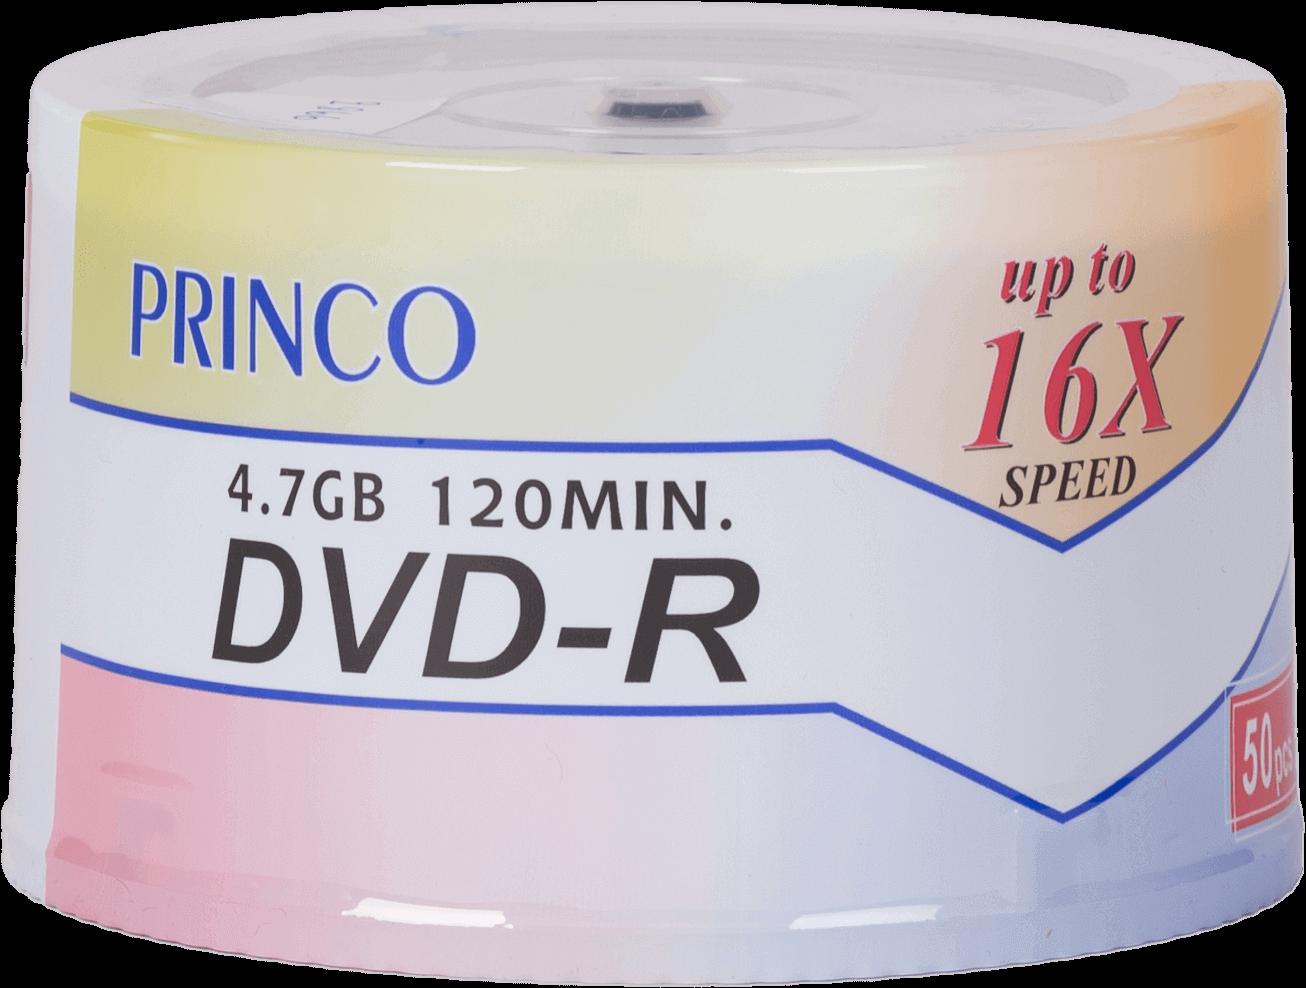 DVD-R PRINCO (1x50)